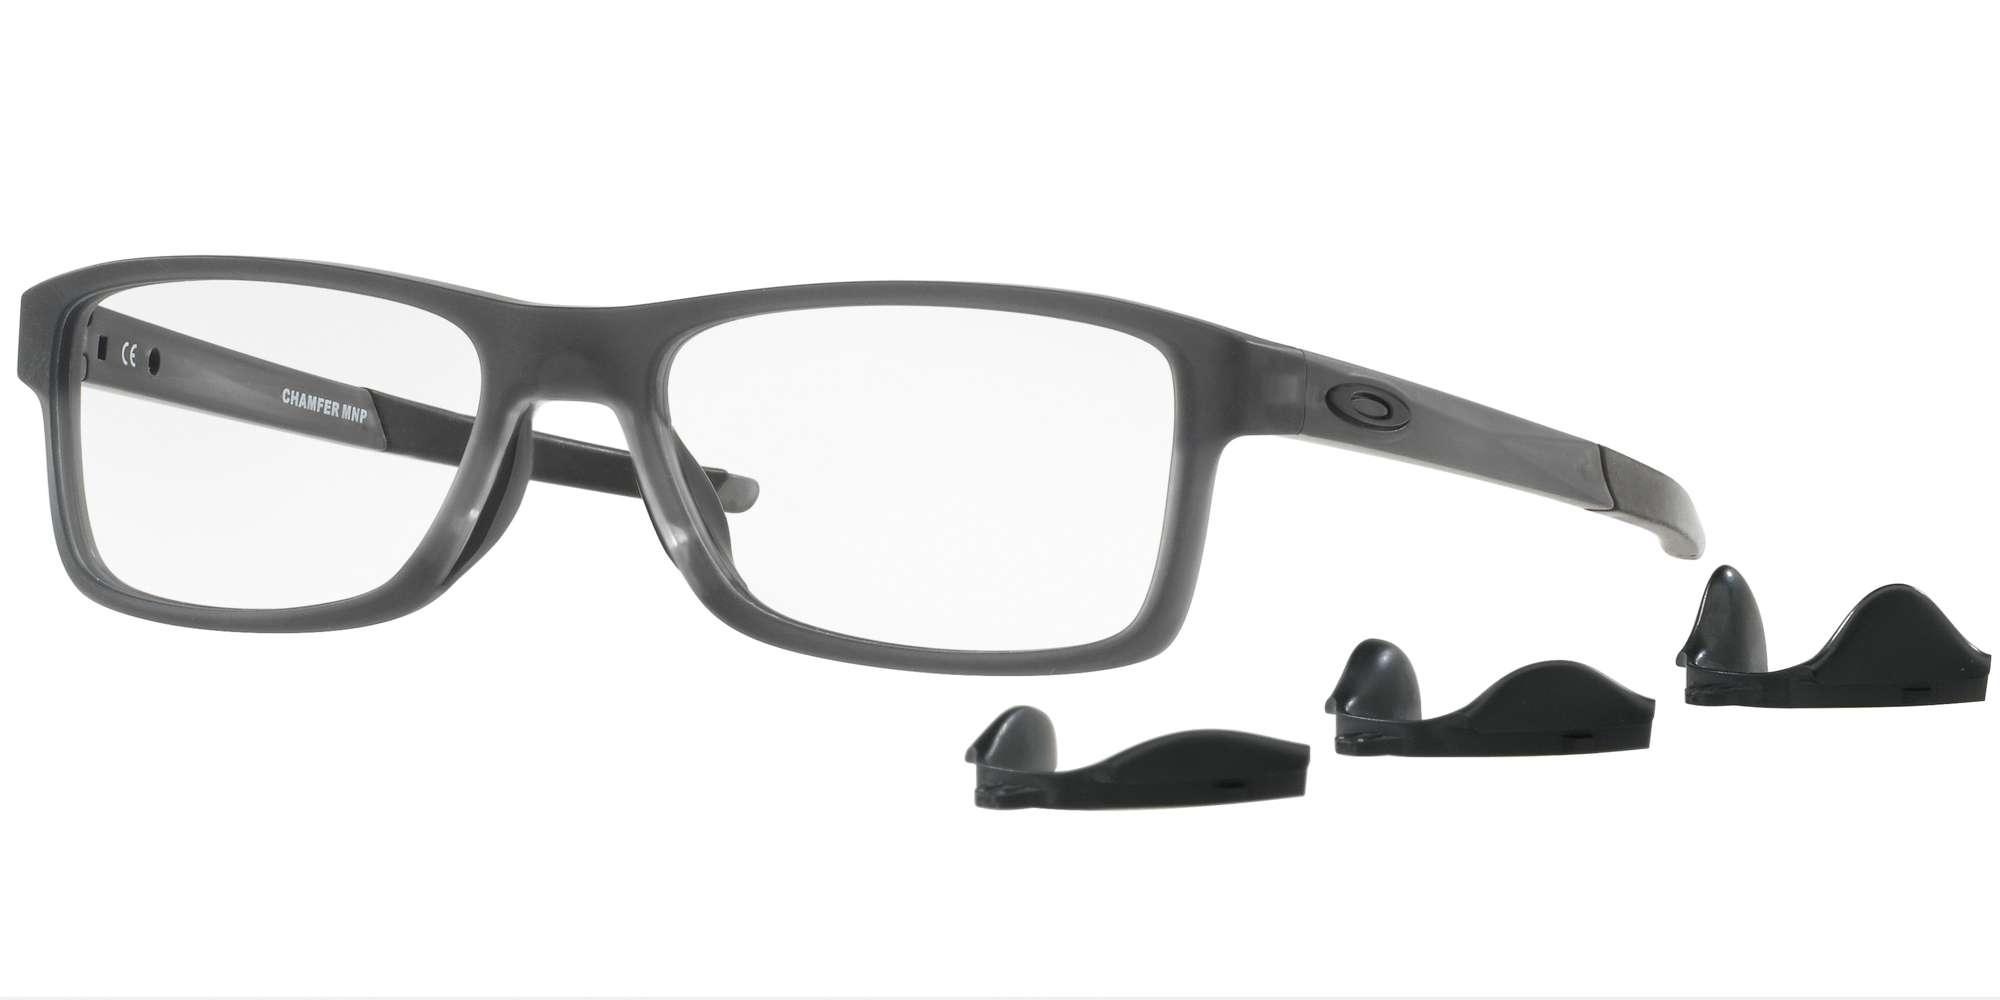 SATIN GREY SMOKE / CLEAR lenses